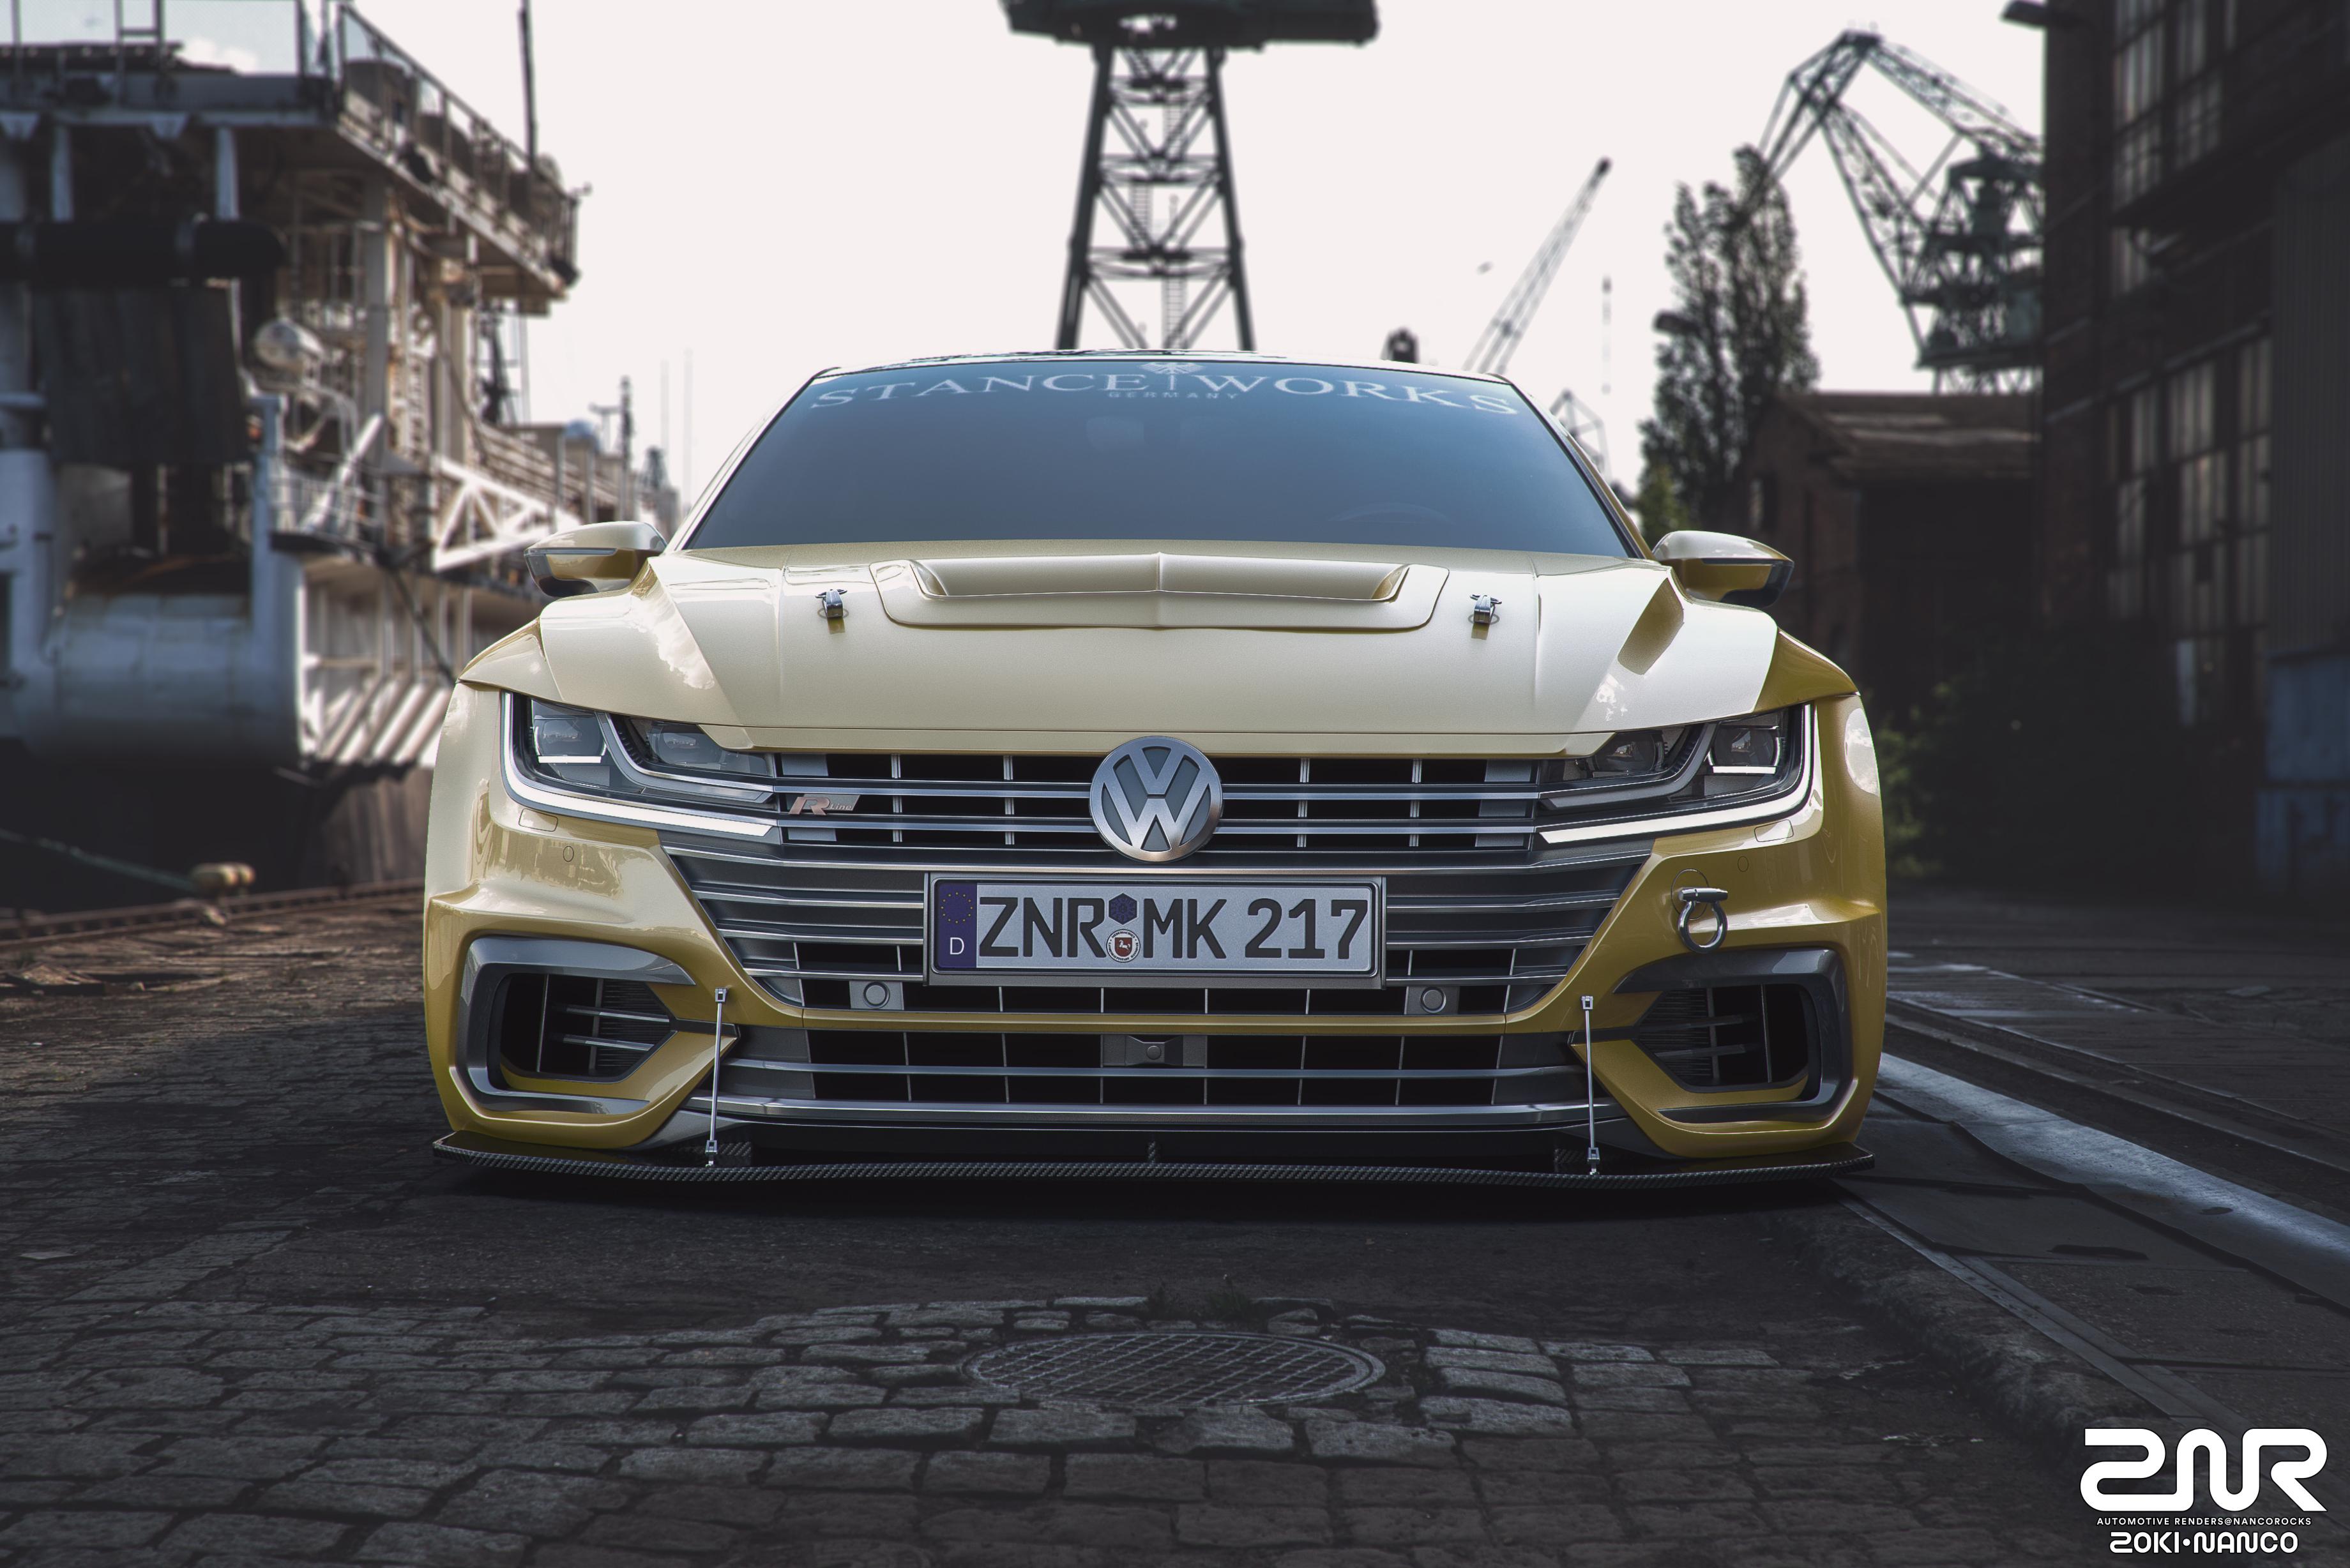 VW Arteon Usa >> Volkswagen Arteon R-Line - custom - by nancorocks on DeviantArt